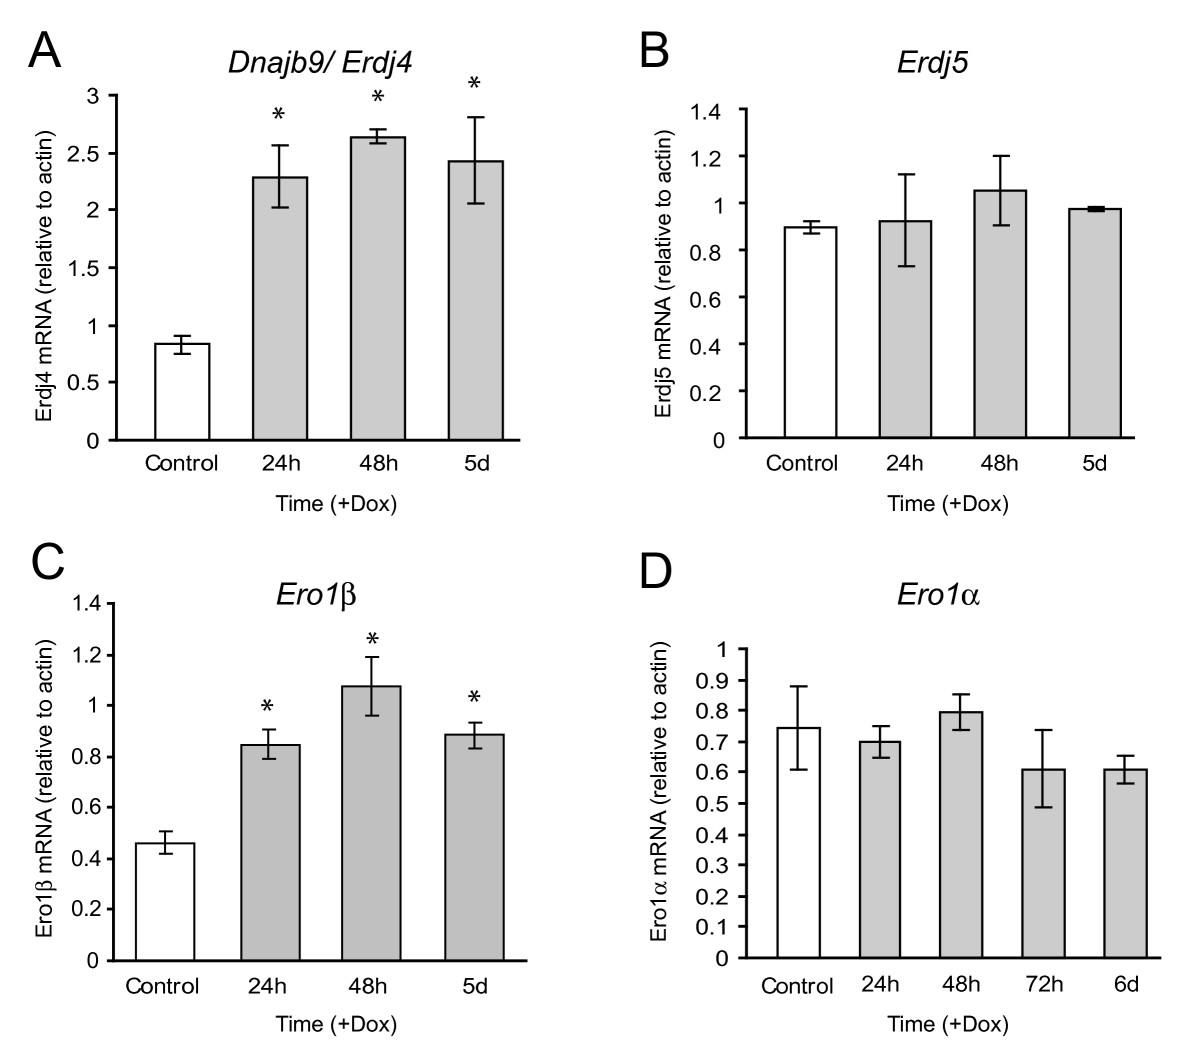 Endoplasmic reticulum stress response in an INS-1 pancreatic